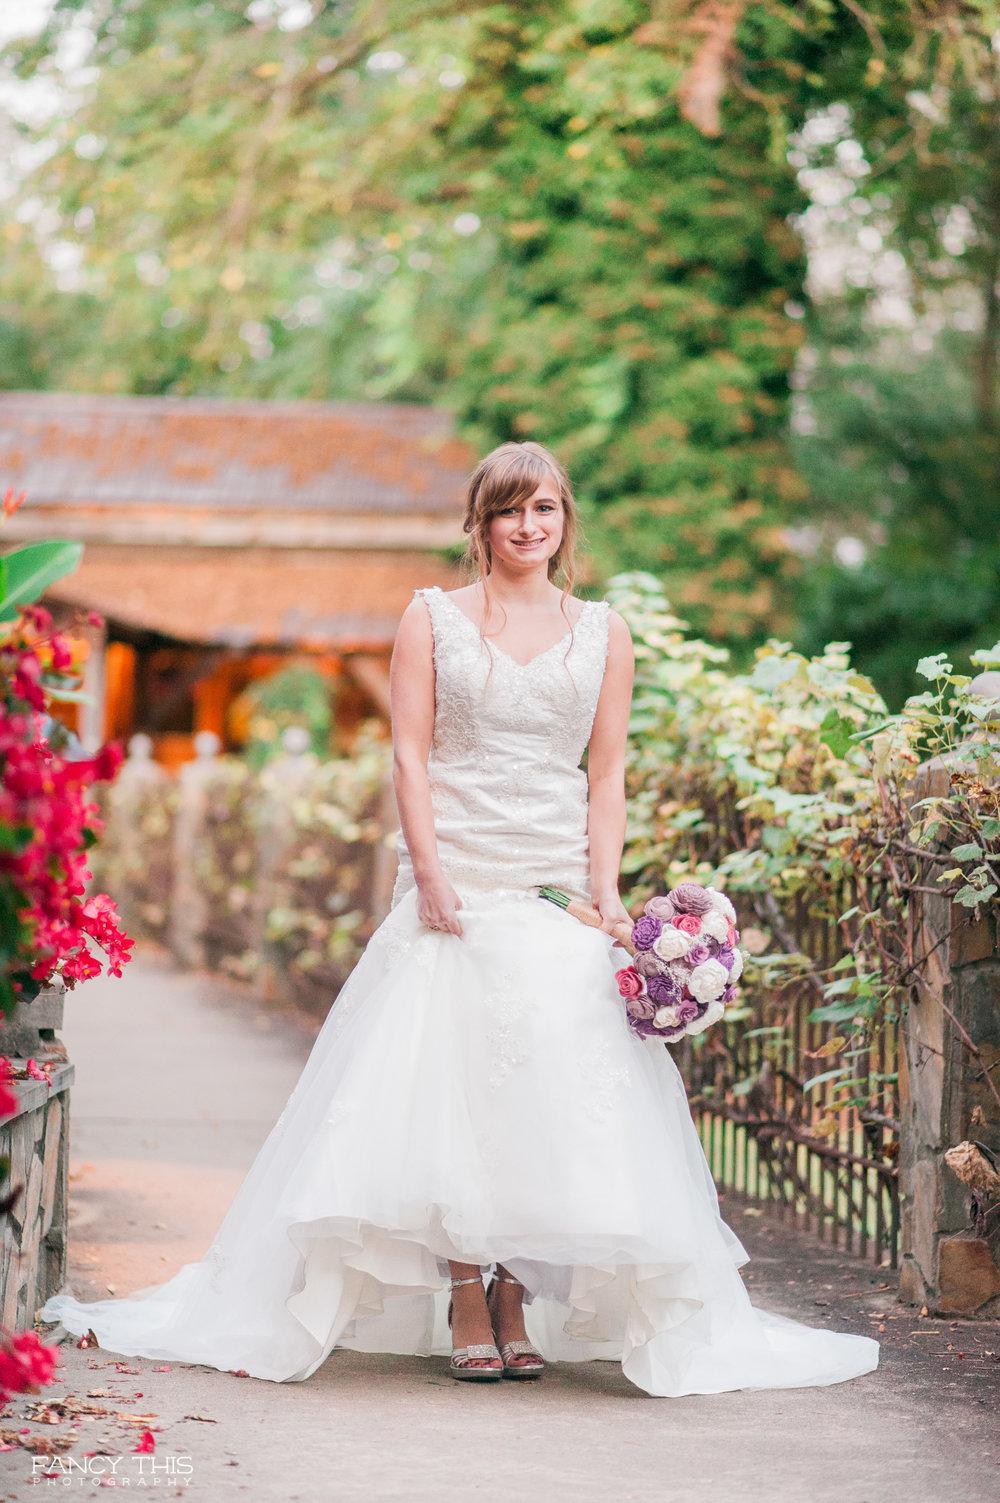 carolsimchik_bridals_socialmediaready-60.jpg